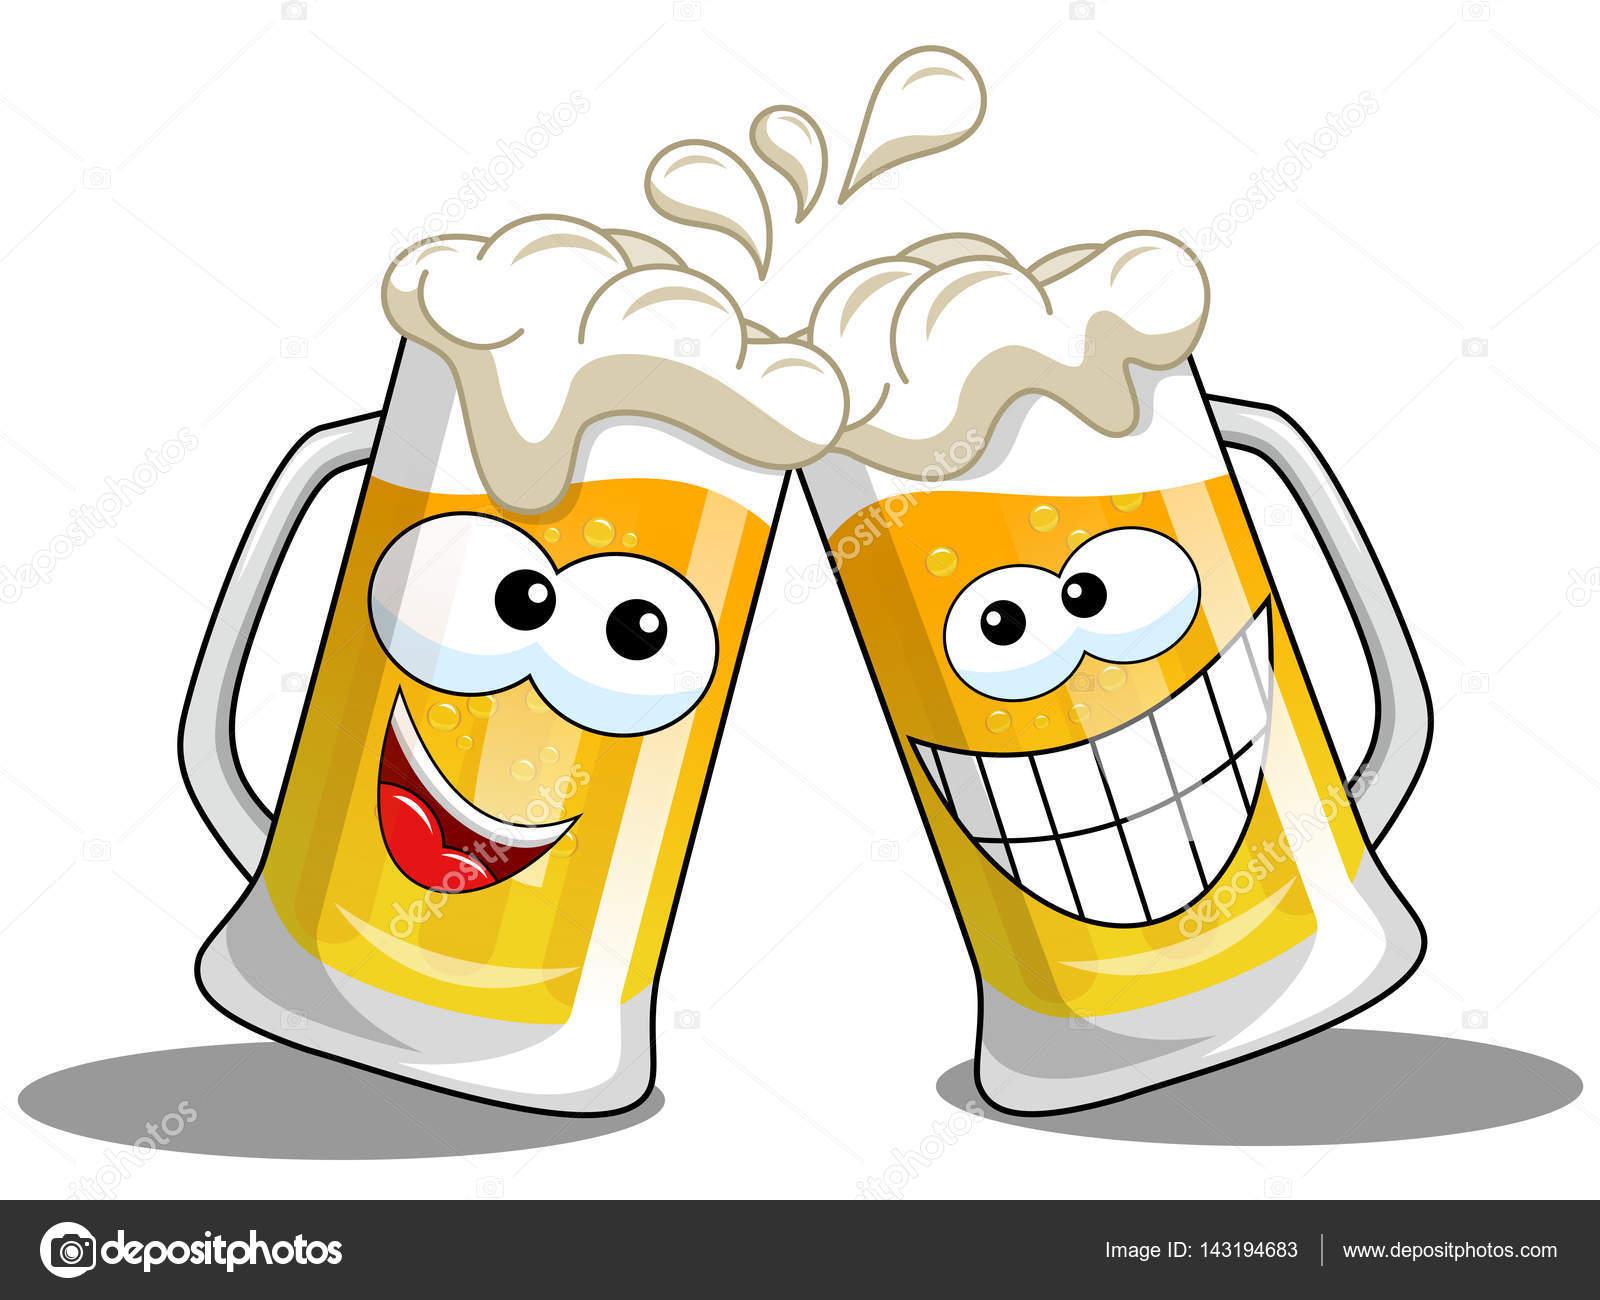 Botella De Cerveza Dibujo: Aislaron De Dibujos Animados Cerveza